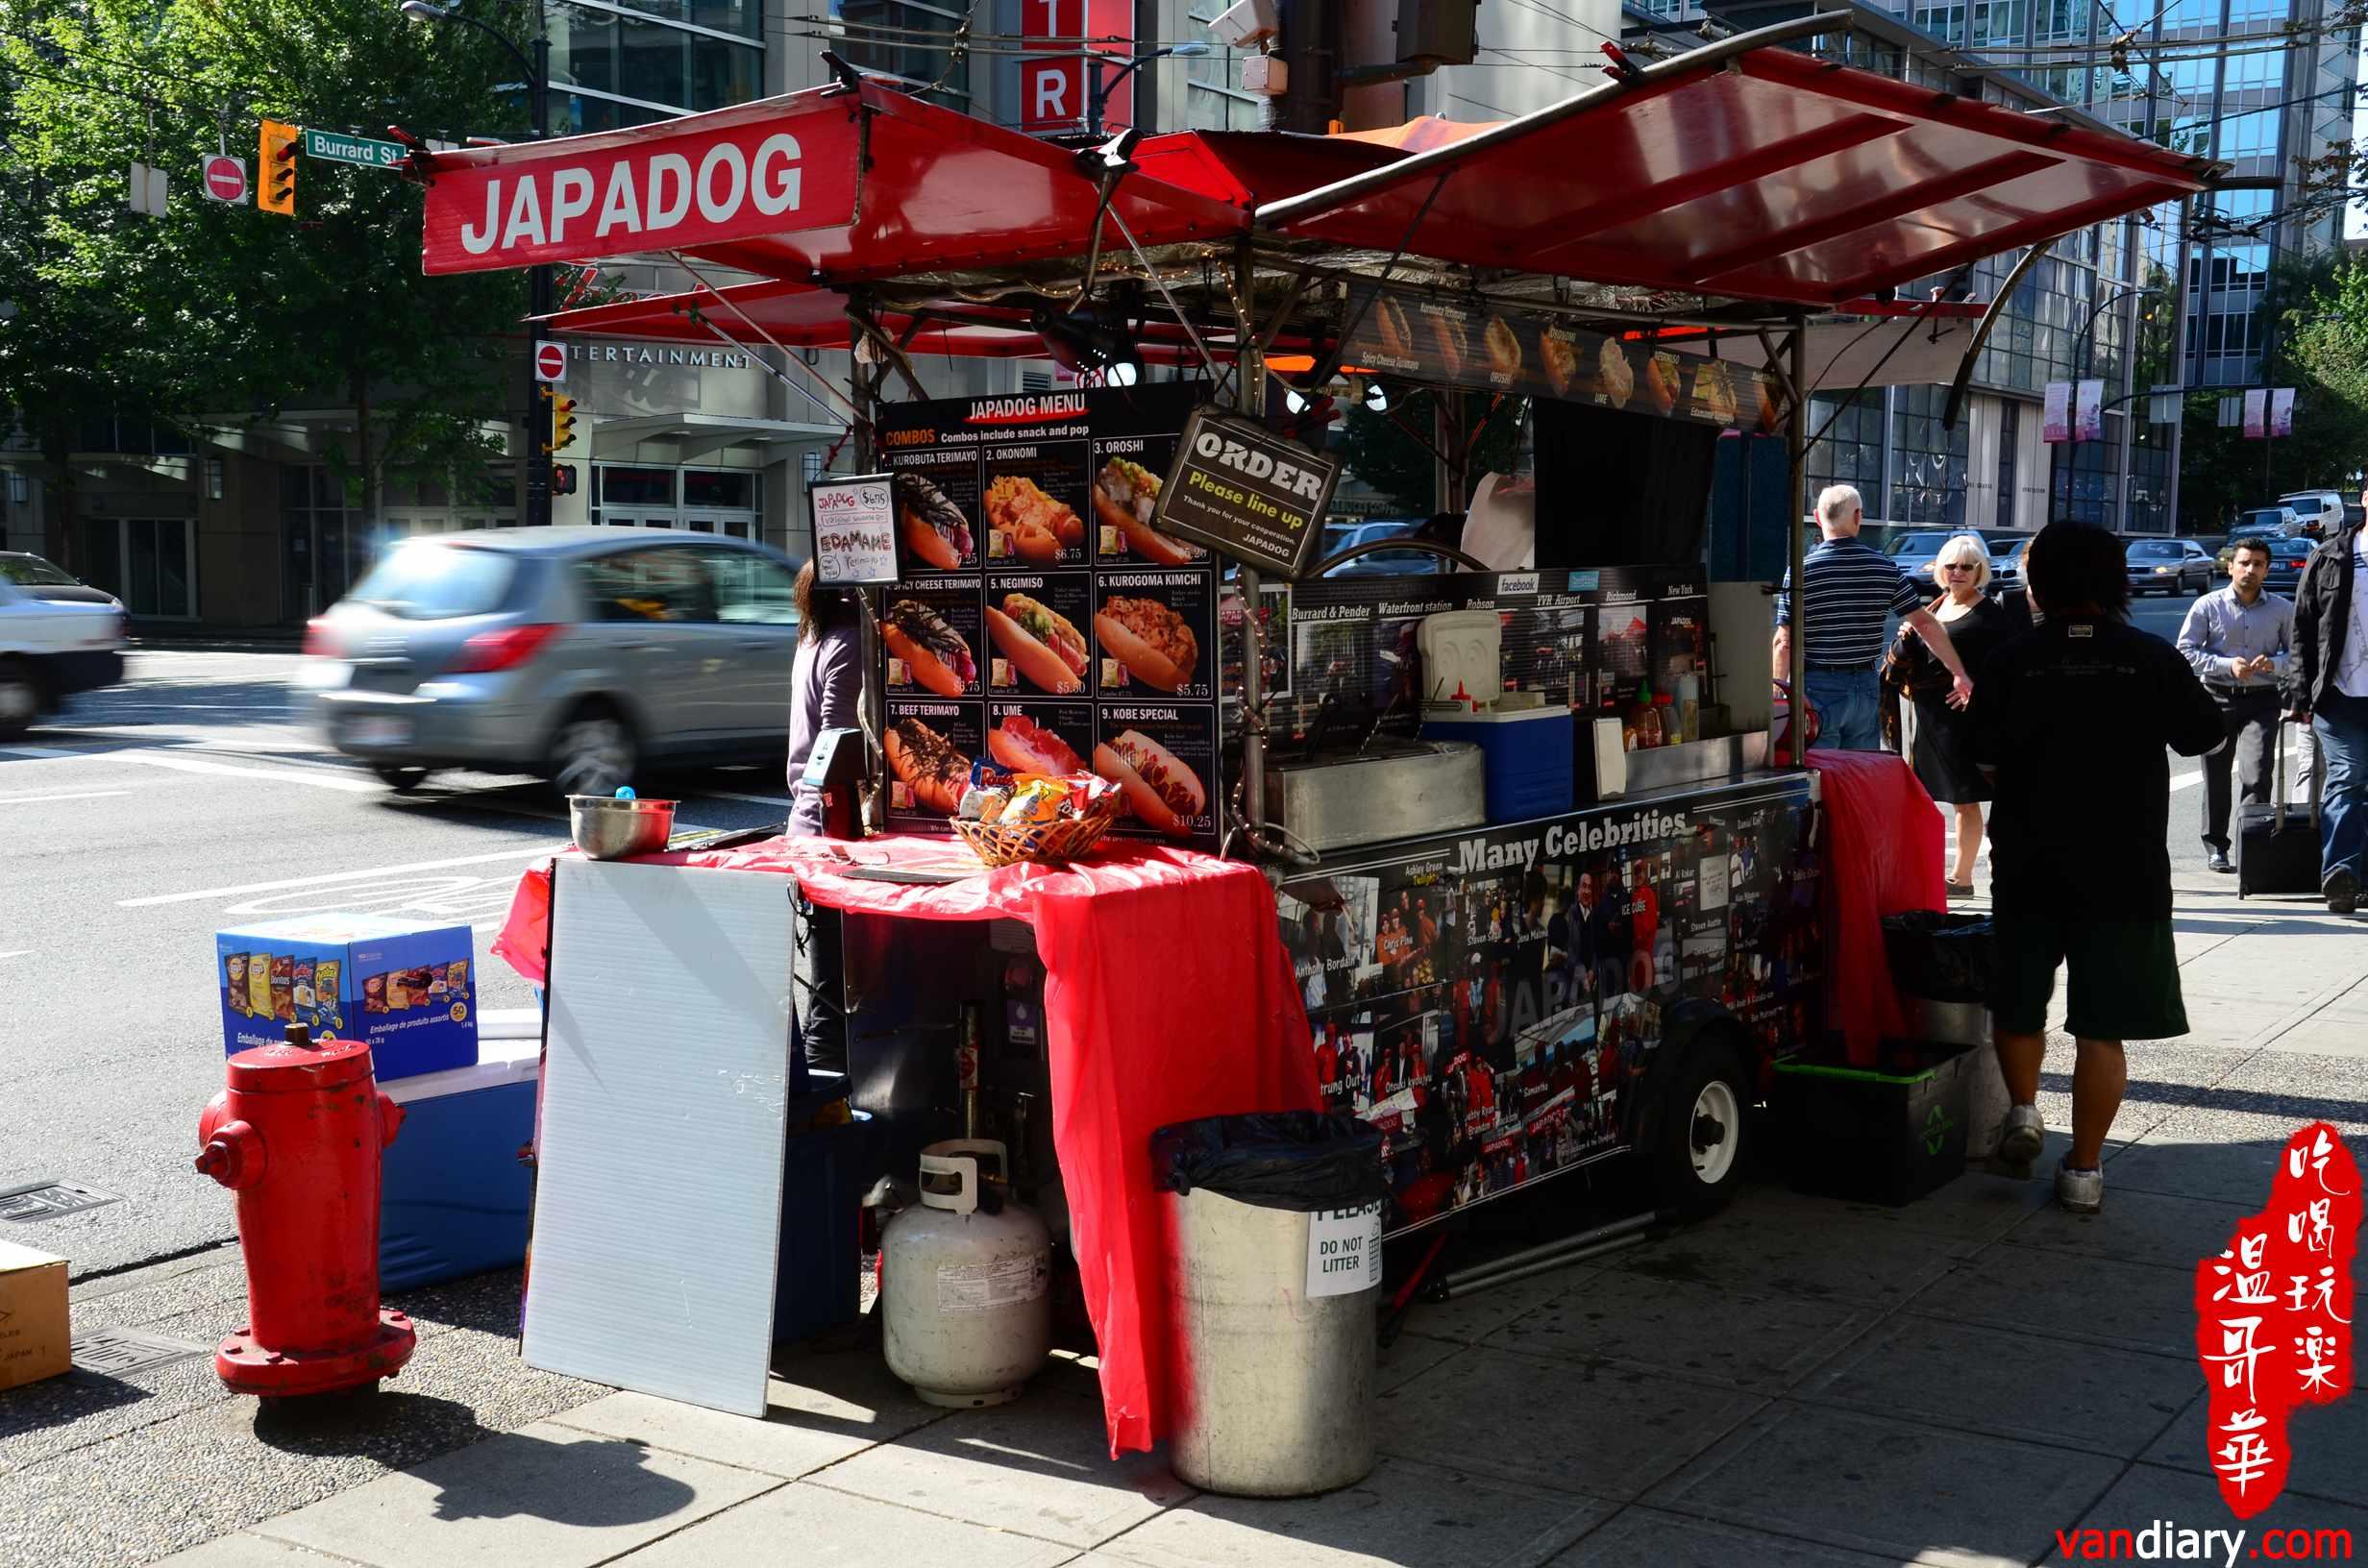 World's Best Street Eats Tour 全球最佳街頭美食之旅 - Vancouver